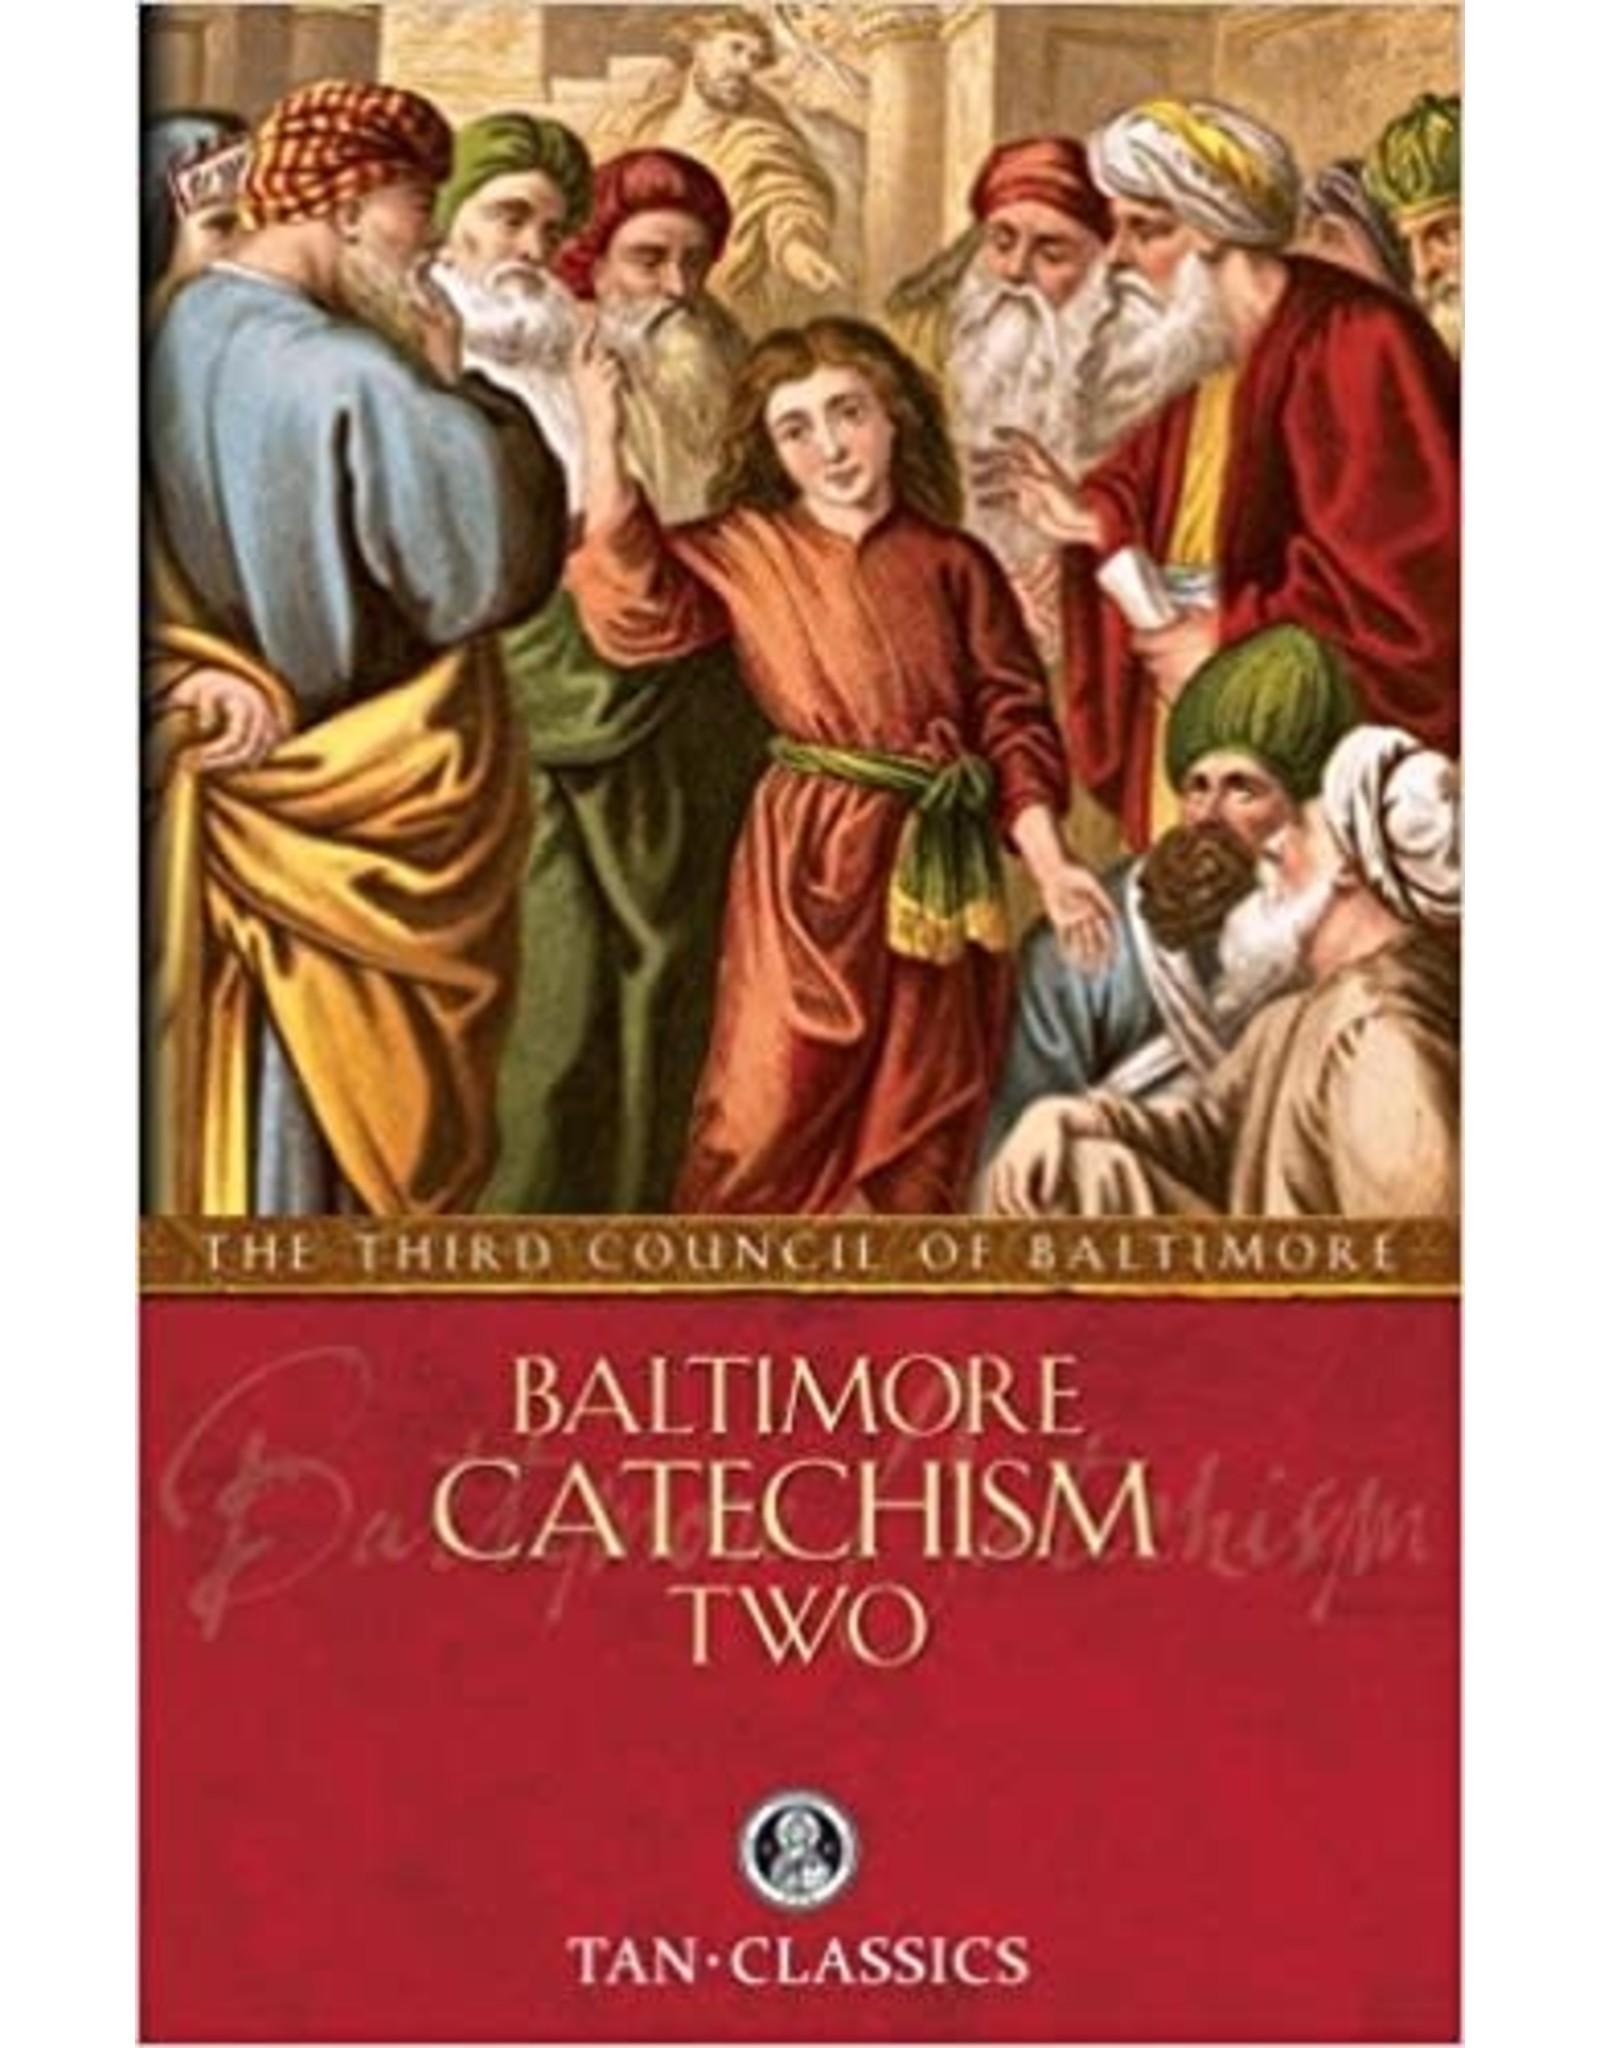 Tan Books Baltimore Catechism Two (with Supplemental Reading: Catholic Prayers) by Rev Thomas Kinkead (Paperback)